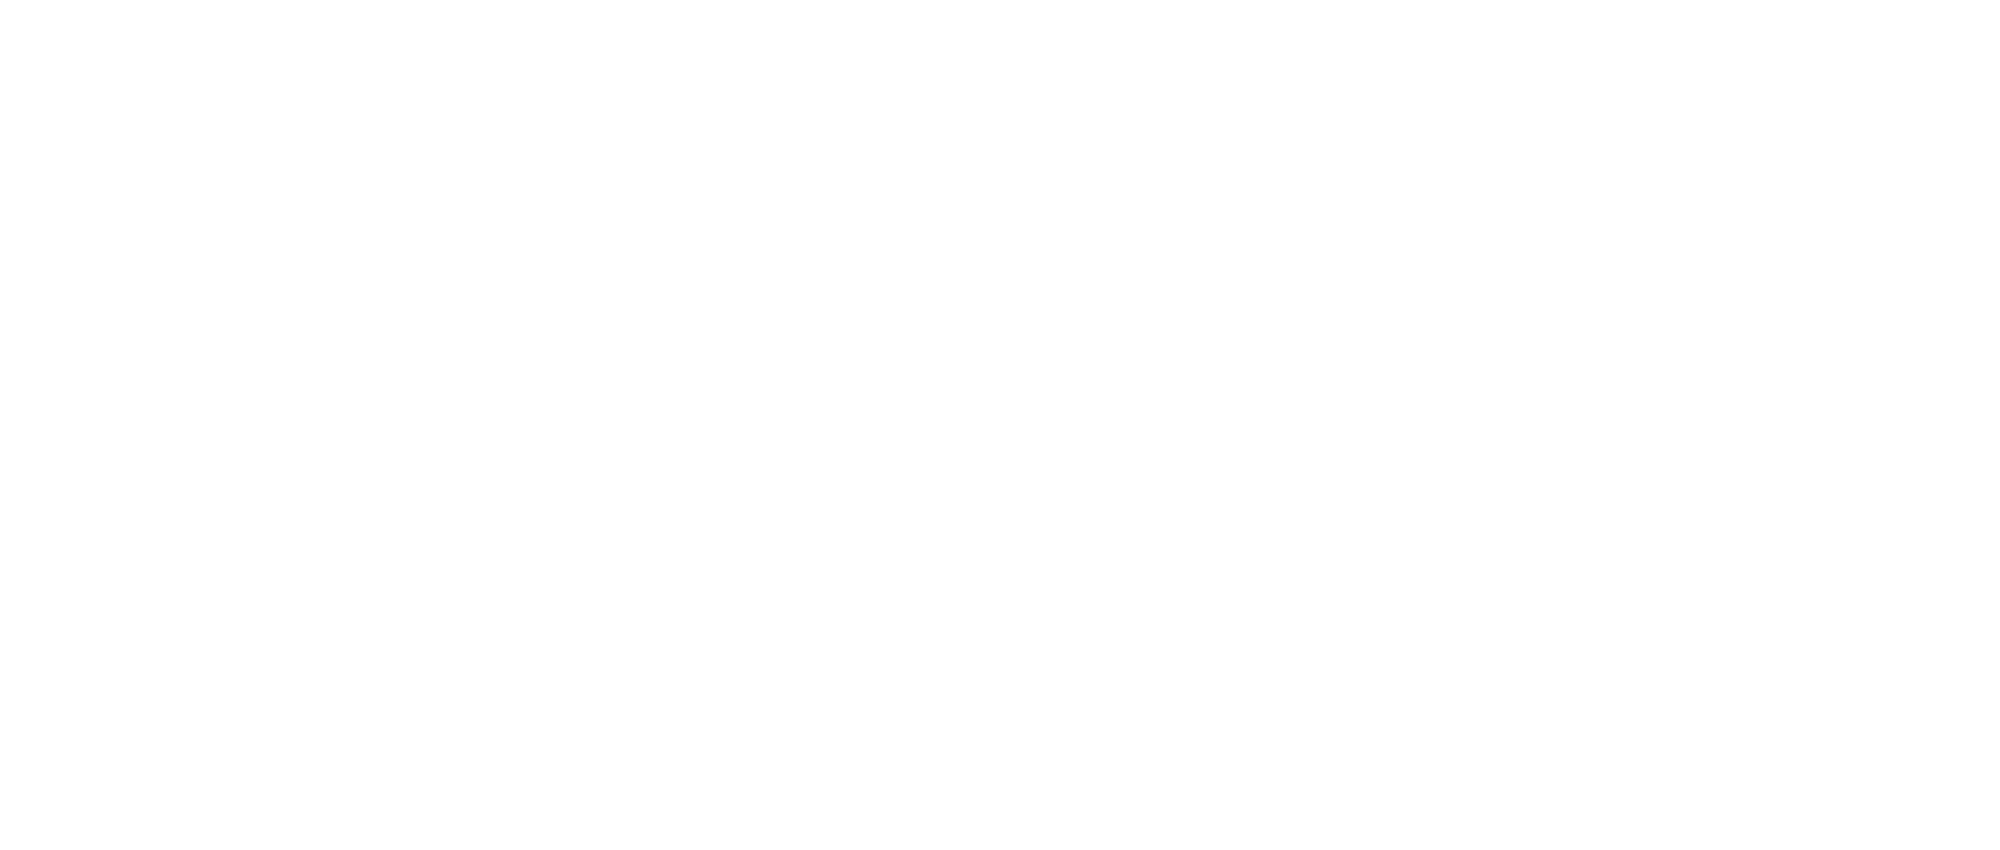 Diakonie Ruhr - Royal Design Referenz Webdesign